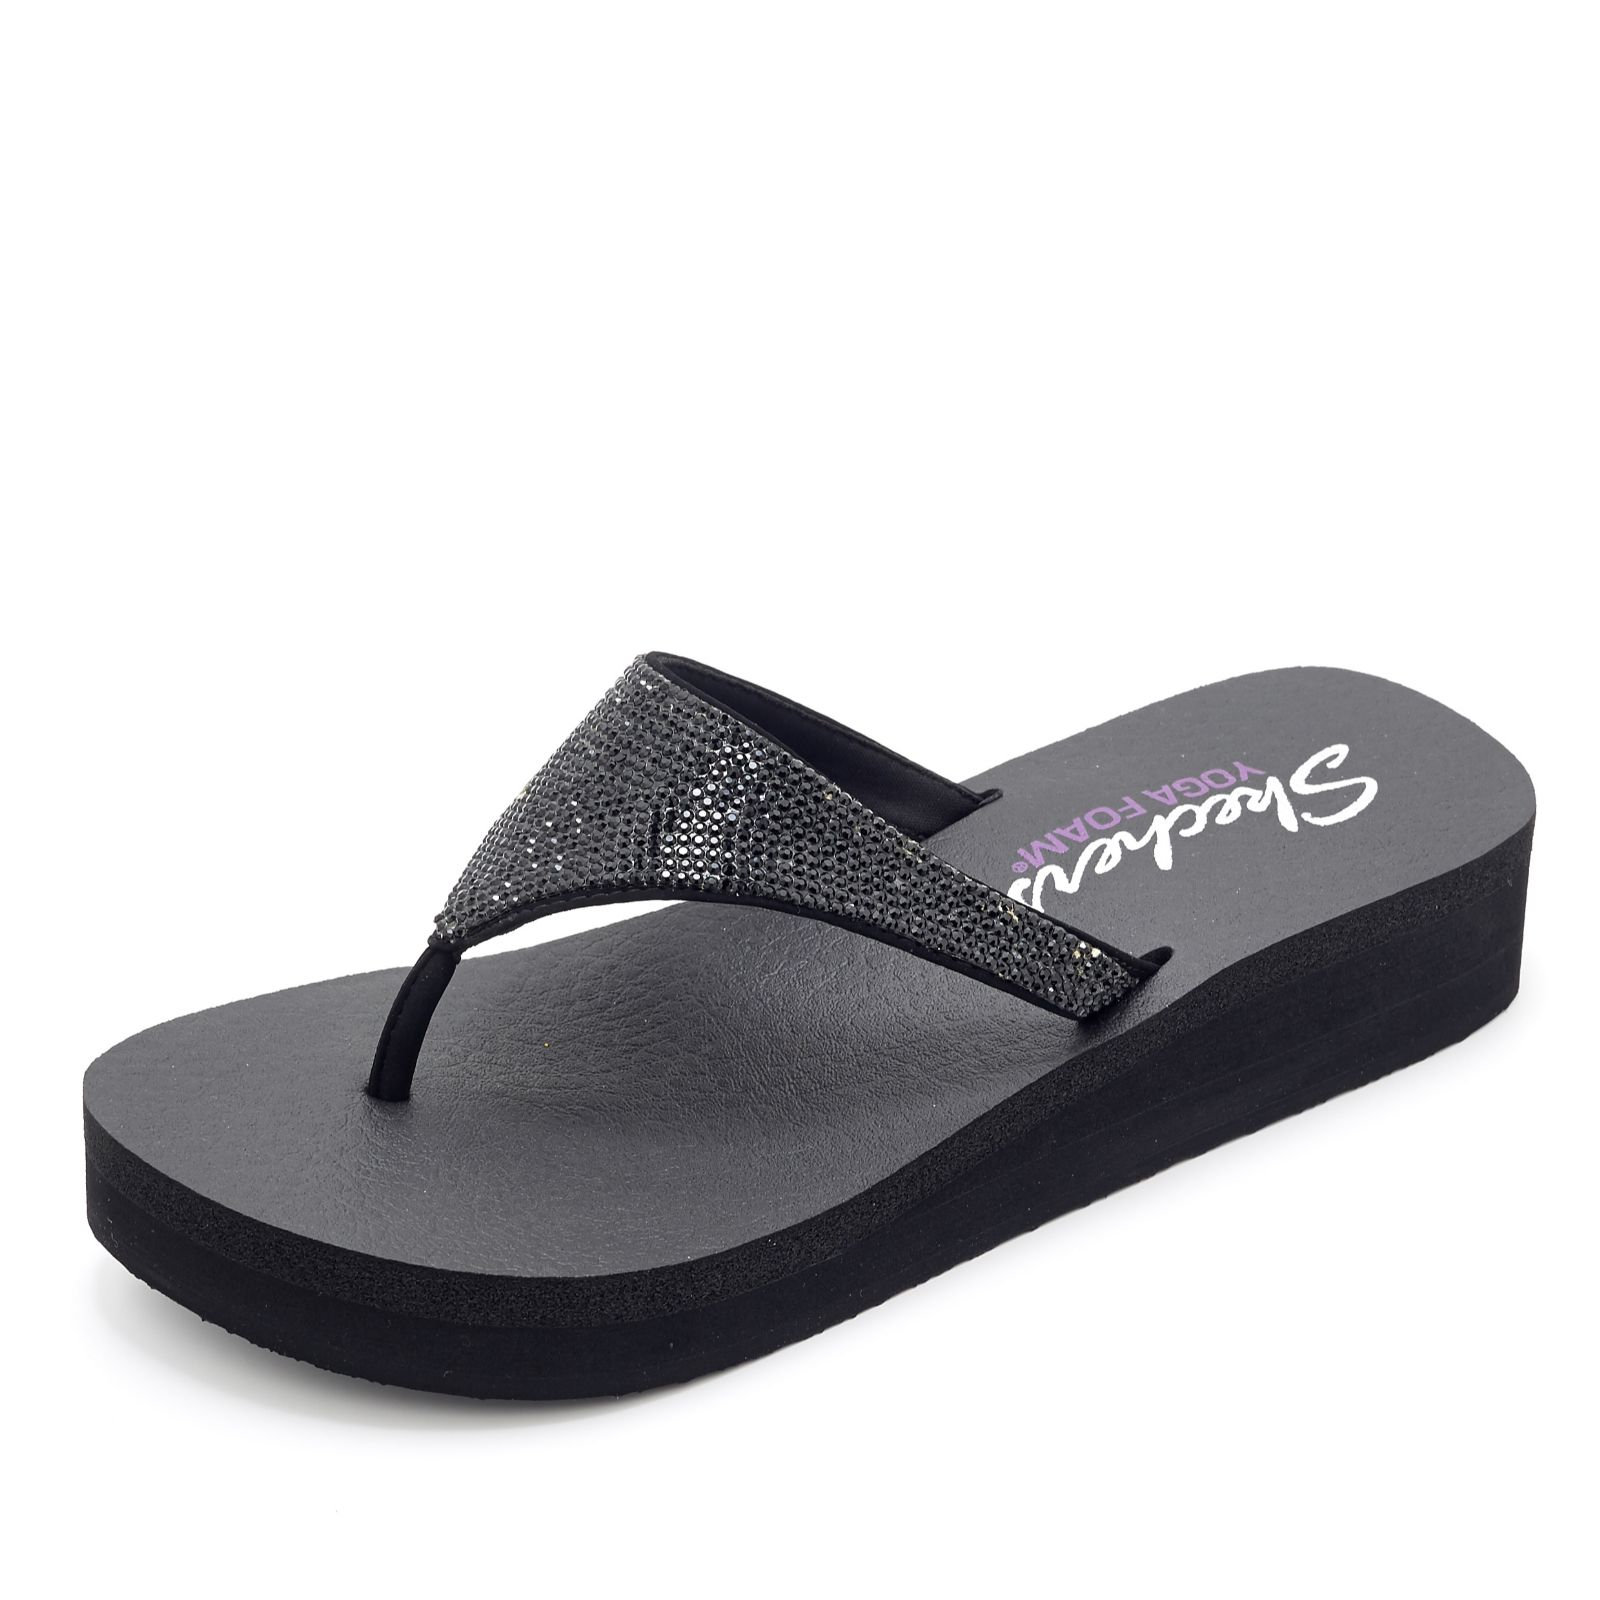 0b58b85fccc7 Skechers Vinyasa Nam On Rhinestone Flip Flop with Yoga Foam ...